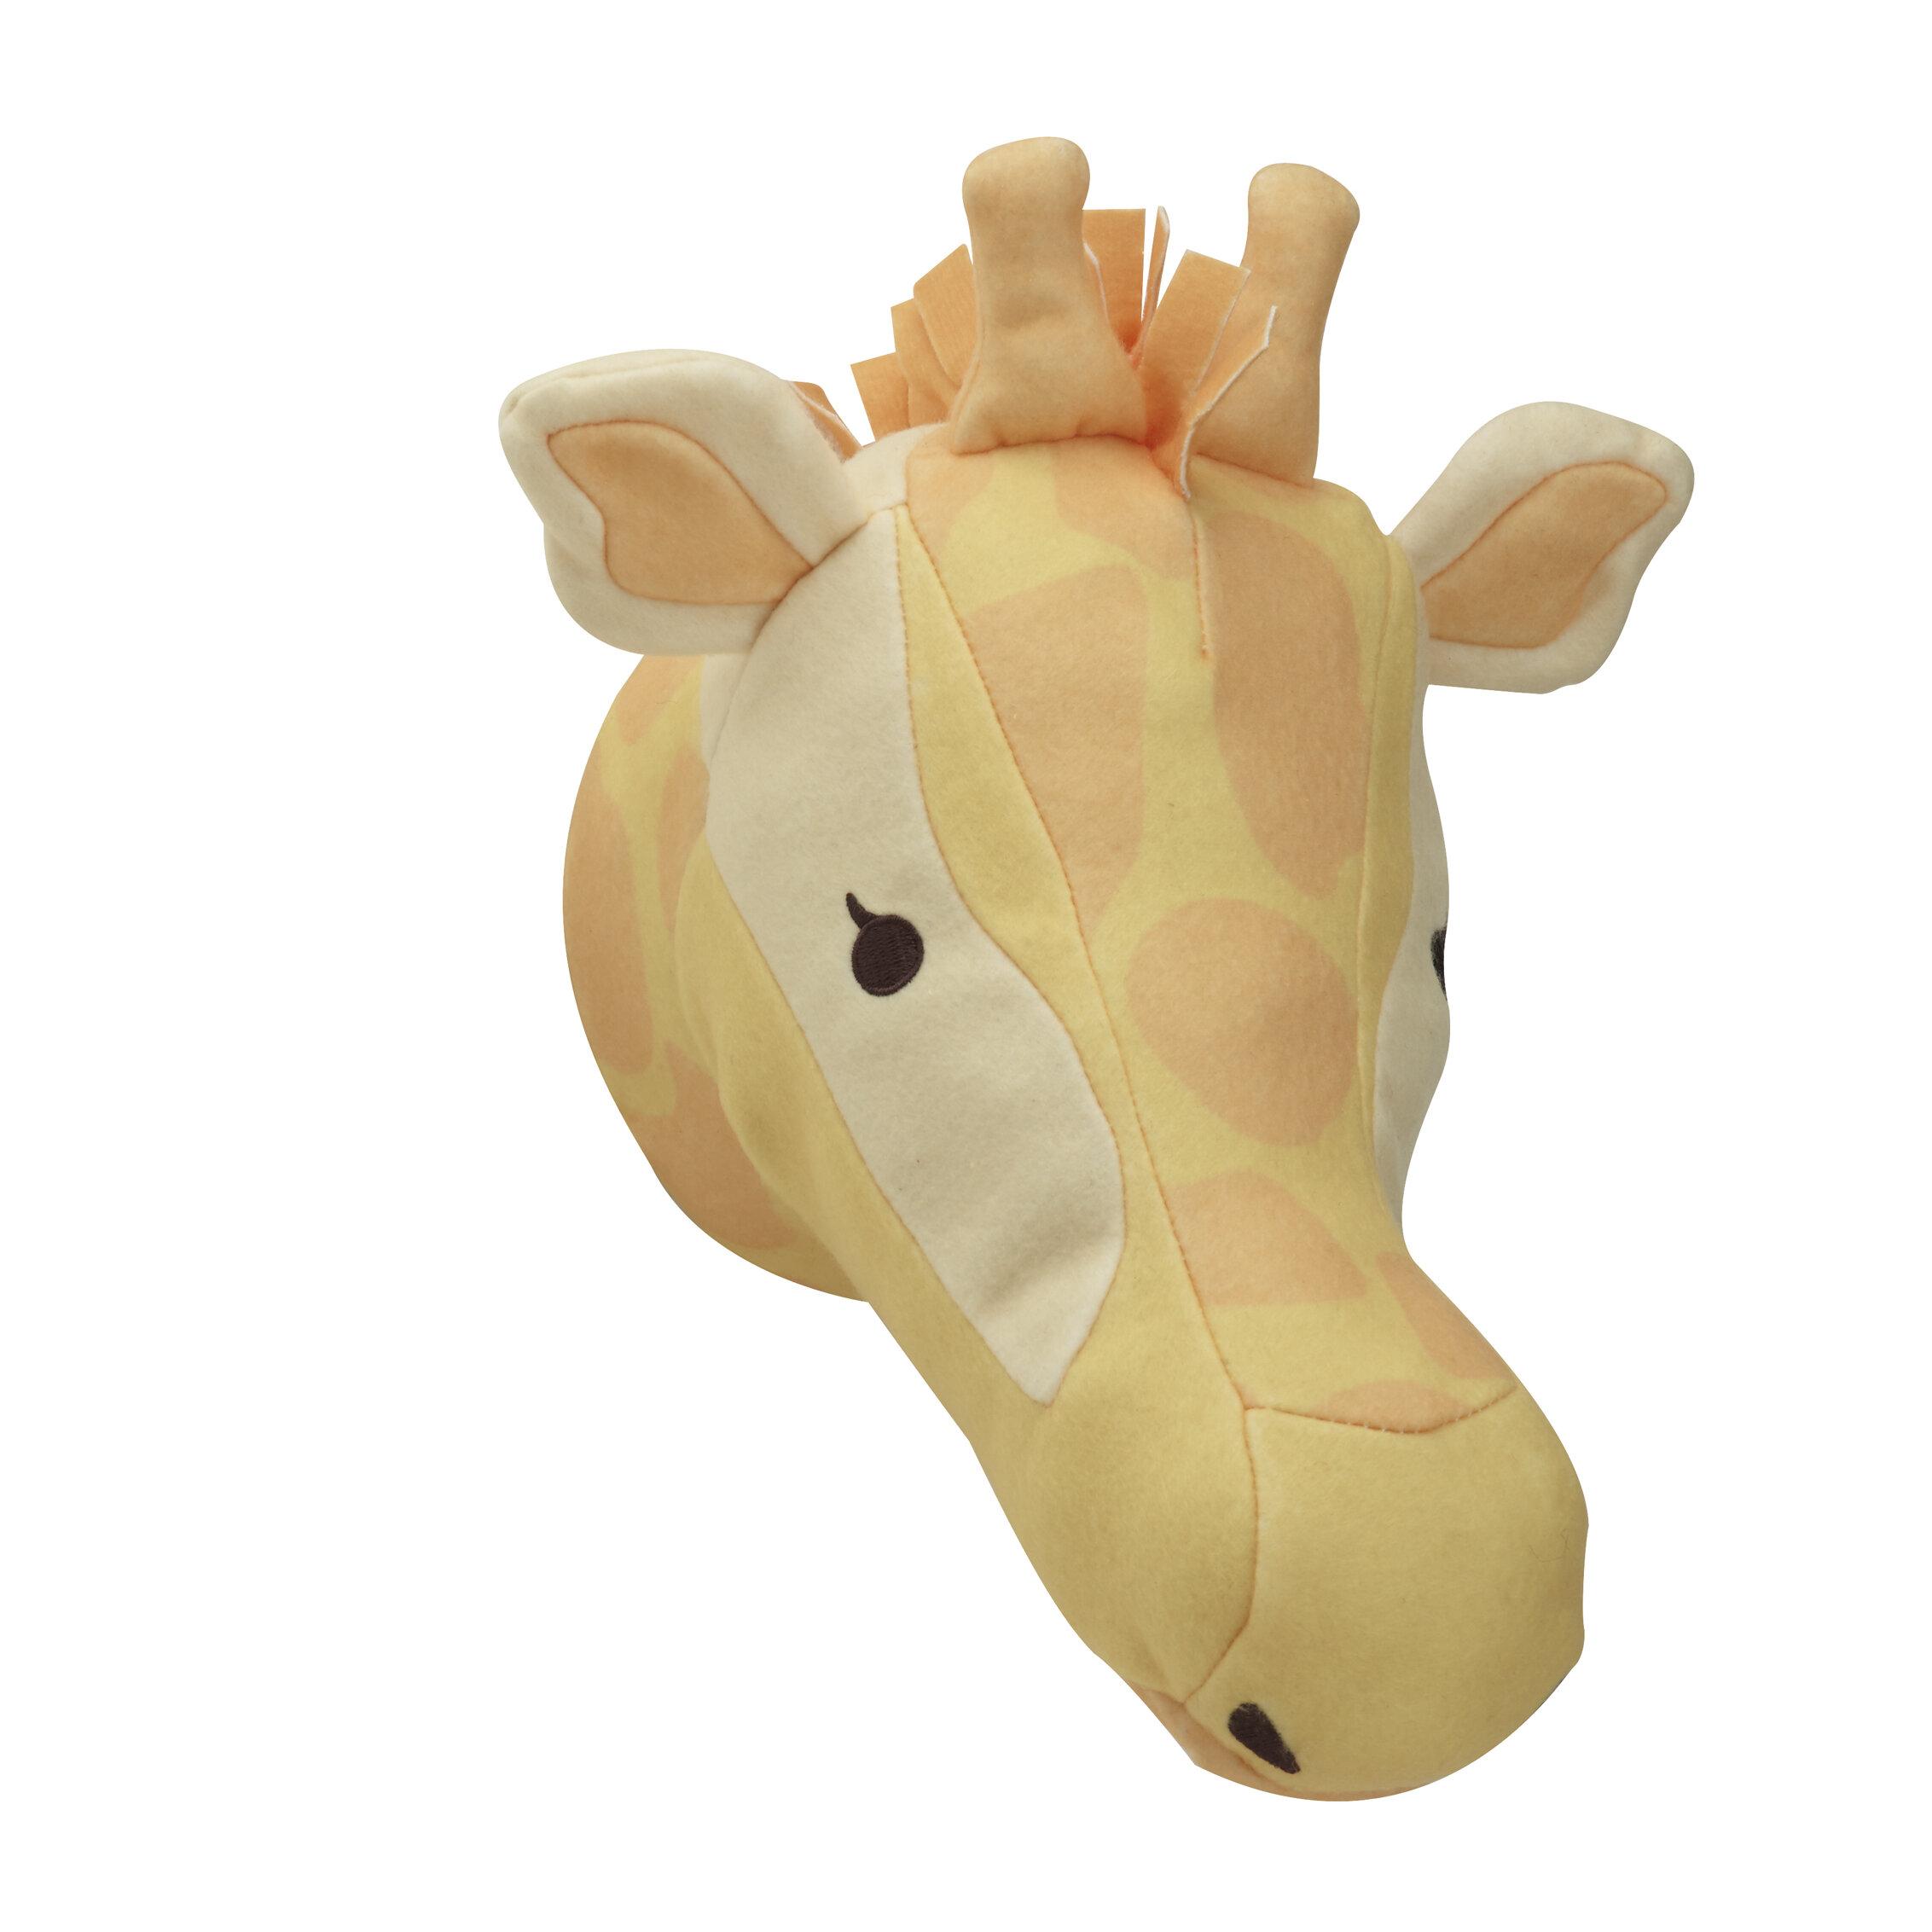 NoJo Zoobilee Plush Giraffe Plush Head Wall Décor | Wayfair